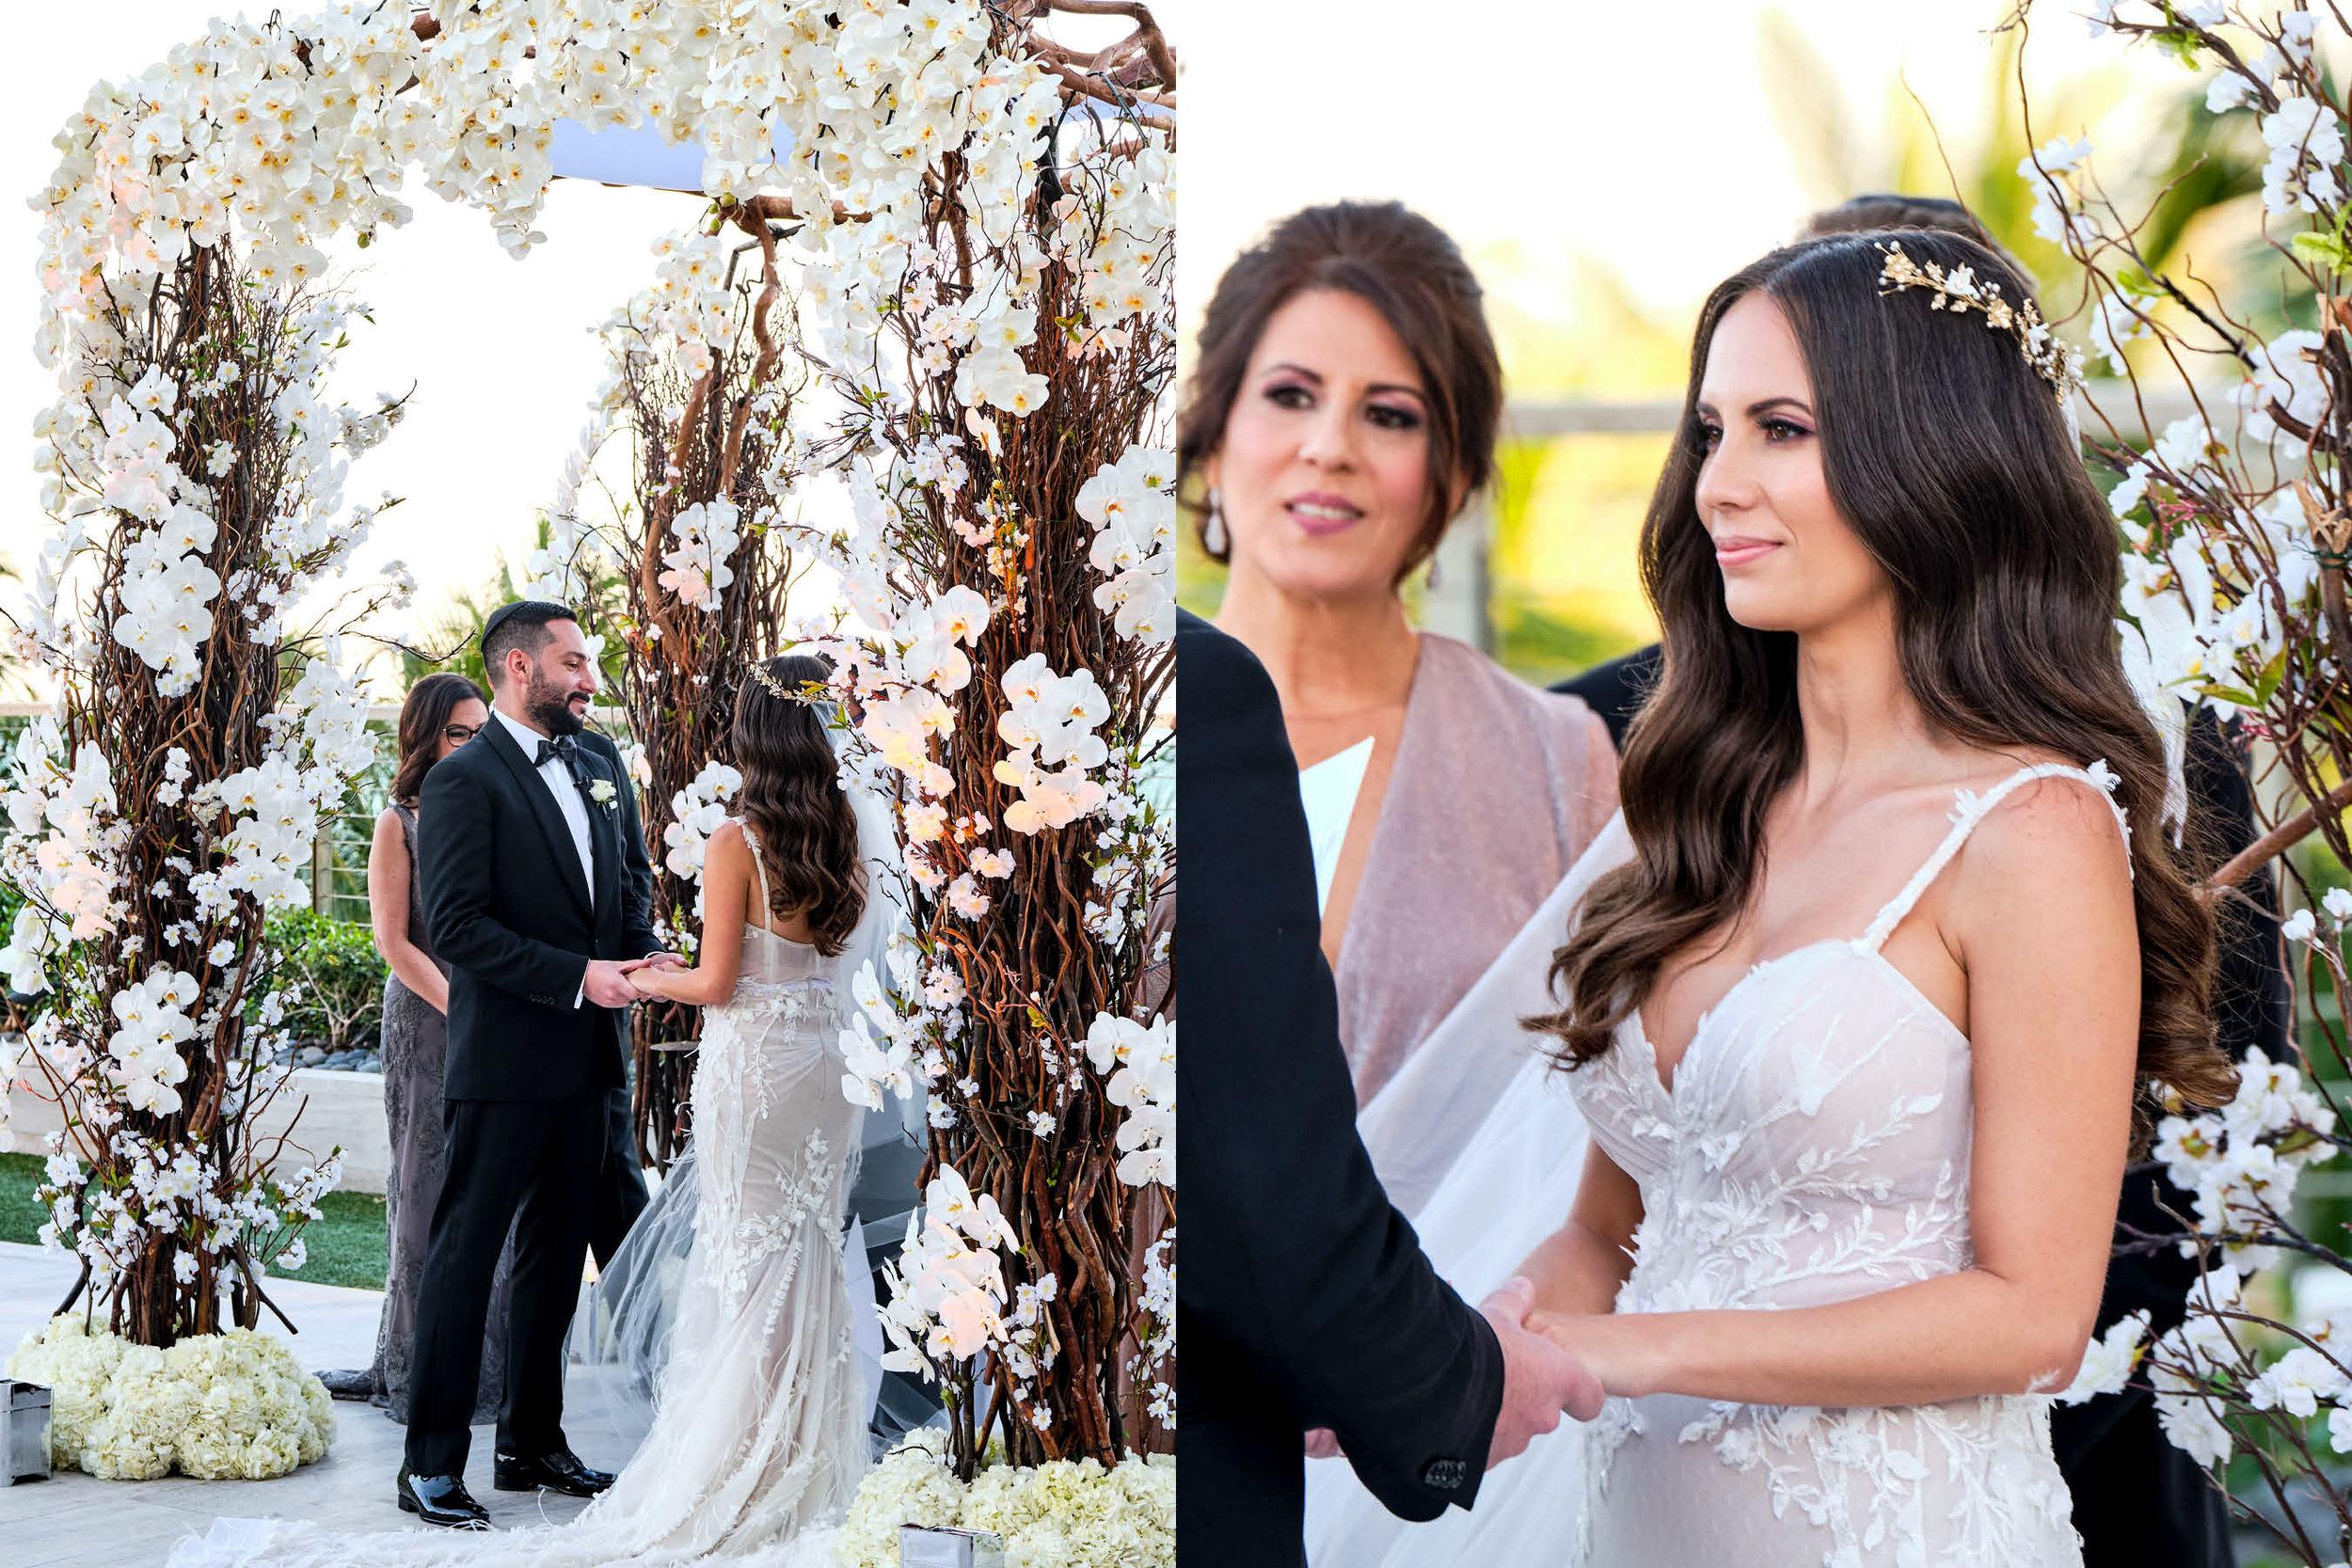 nonesuch_nyc_wedding_photographers_the_edition_miami_wedding_1029_1.JPG